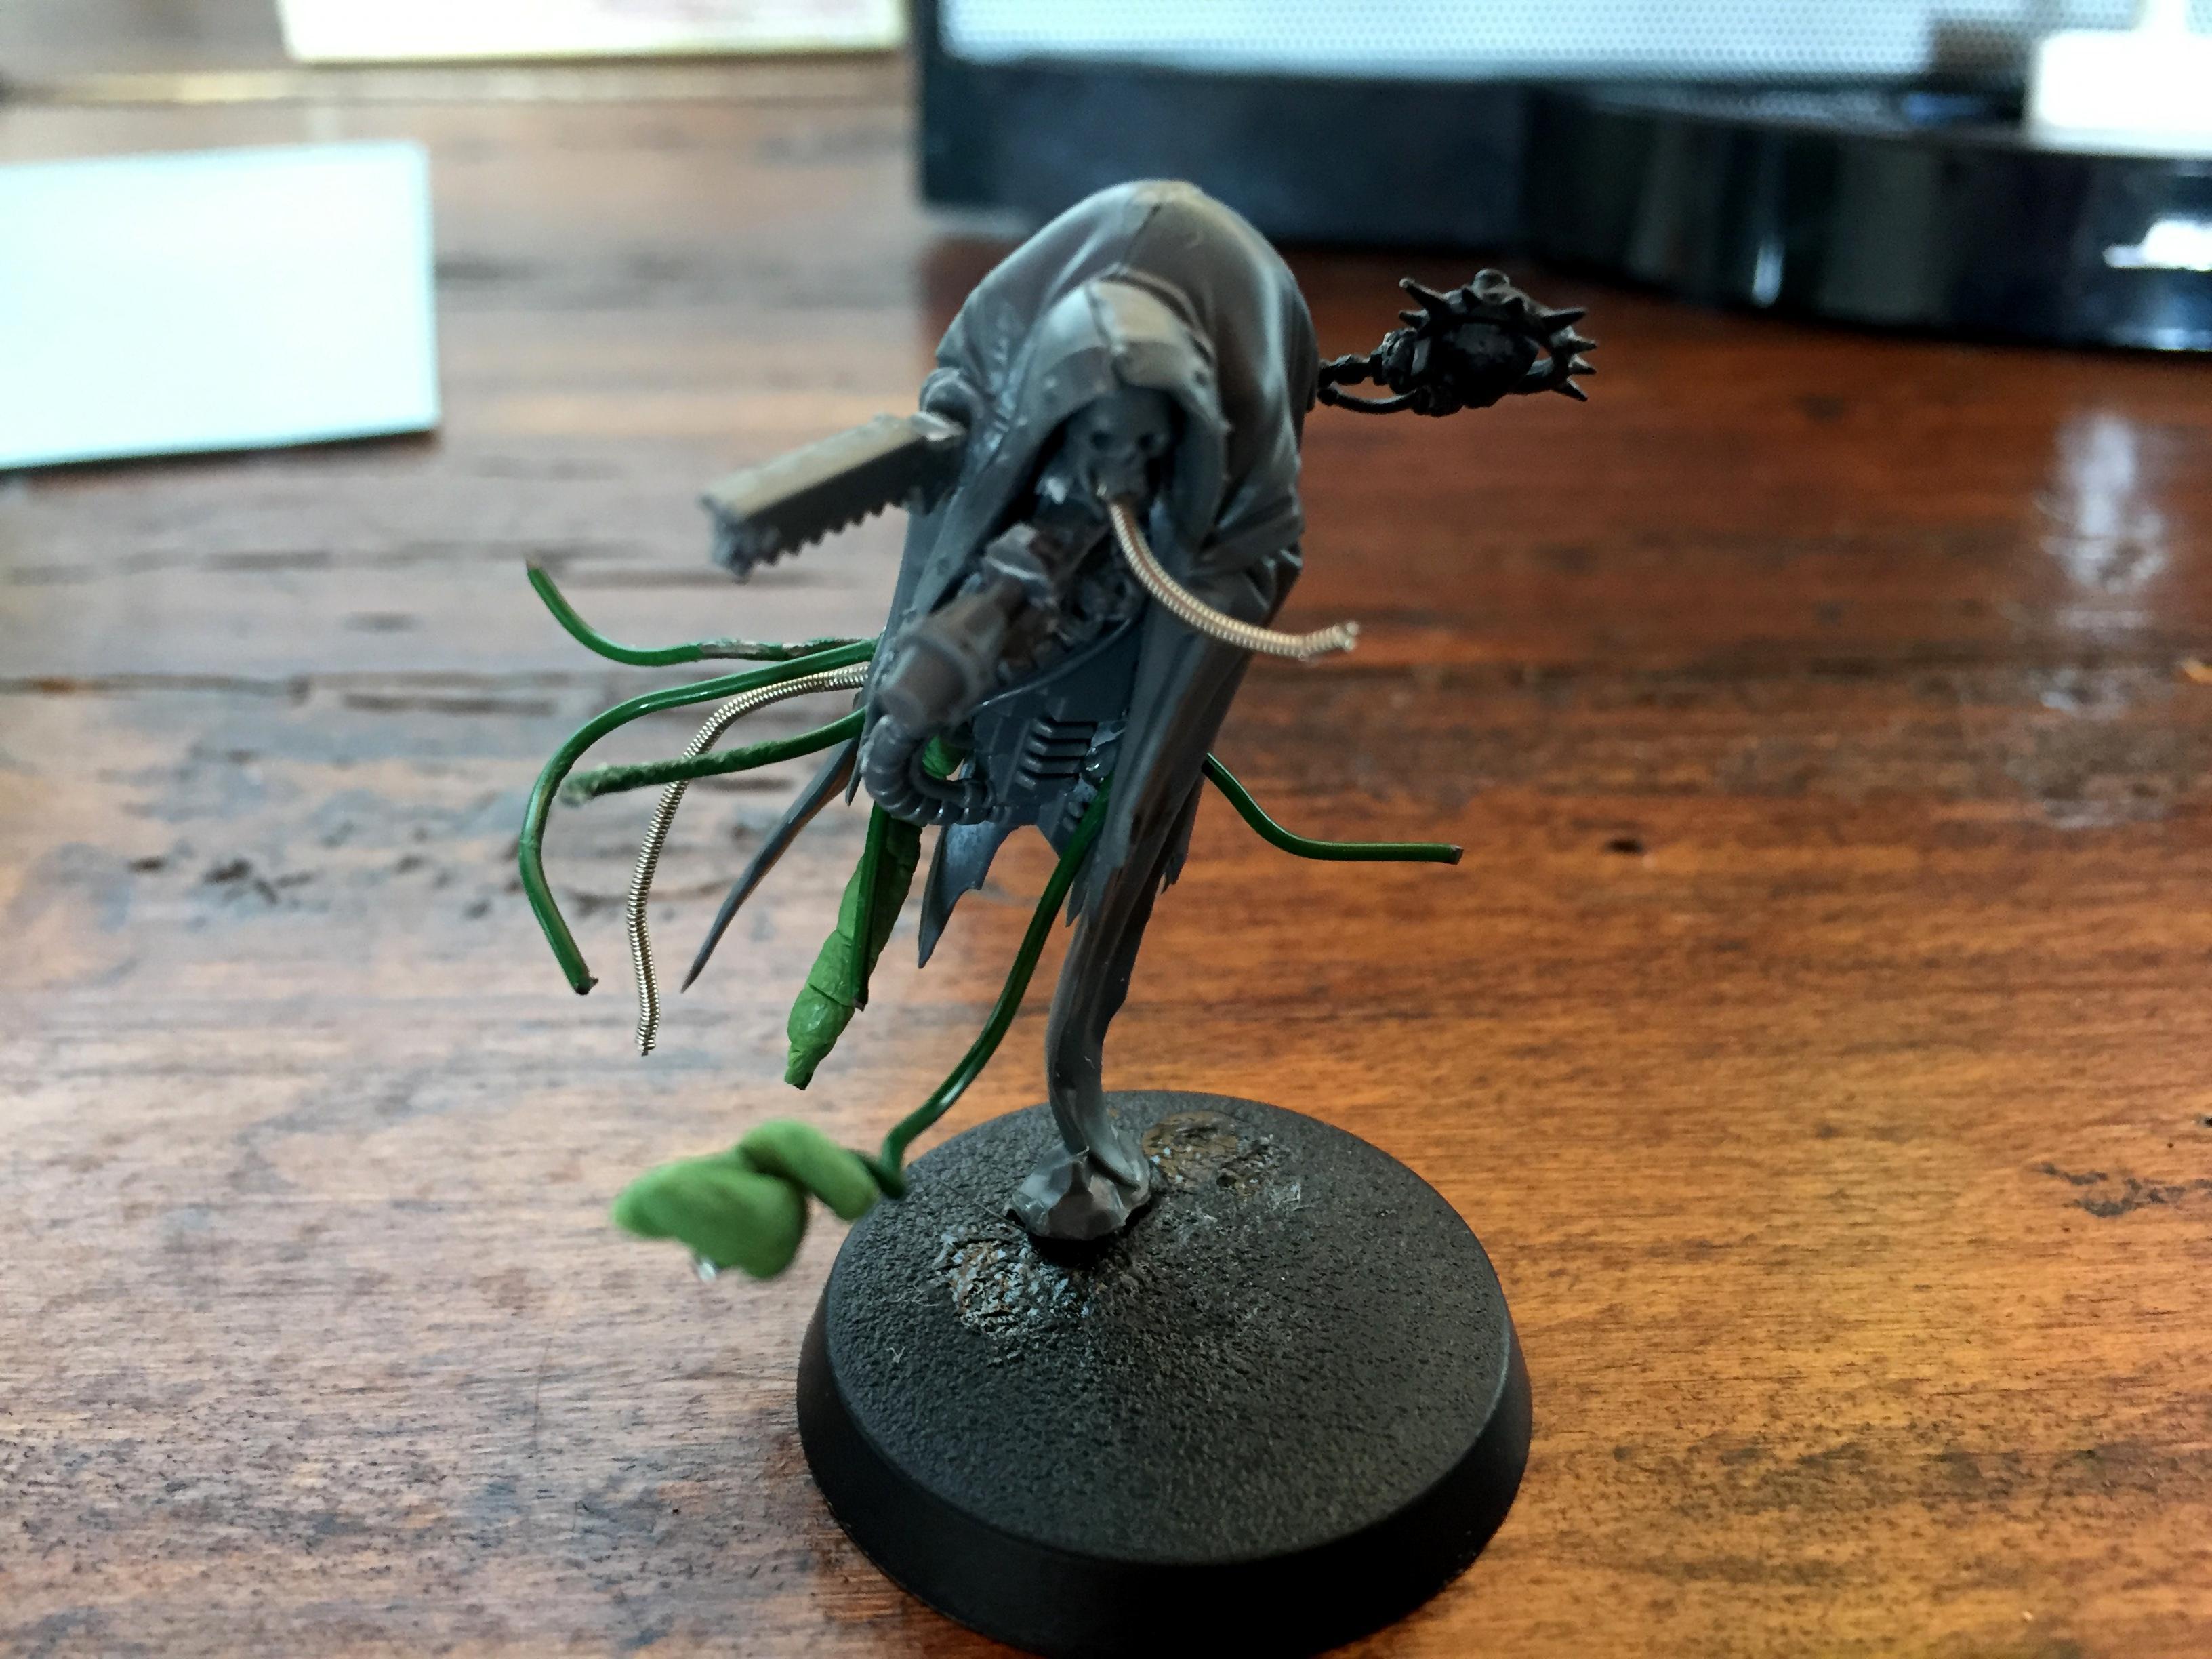 Adeptus Mechanicus, Cairn Wraith, Conversion, Tech Priest